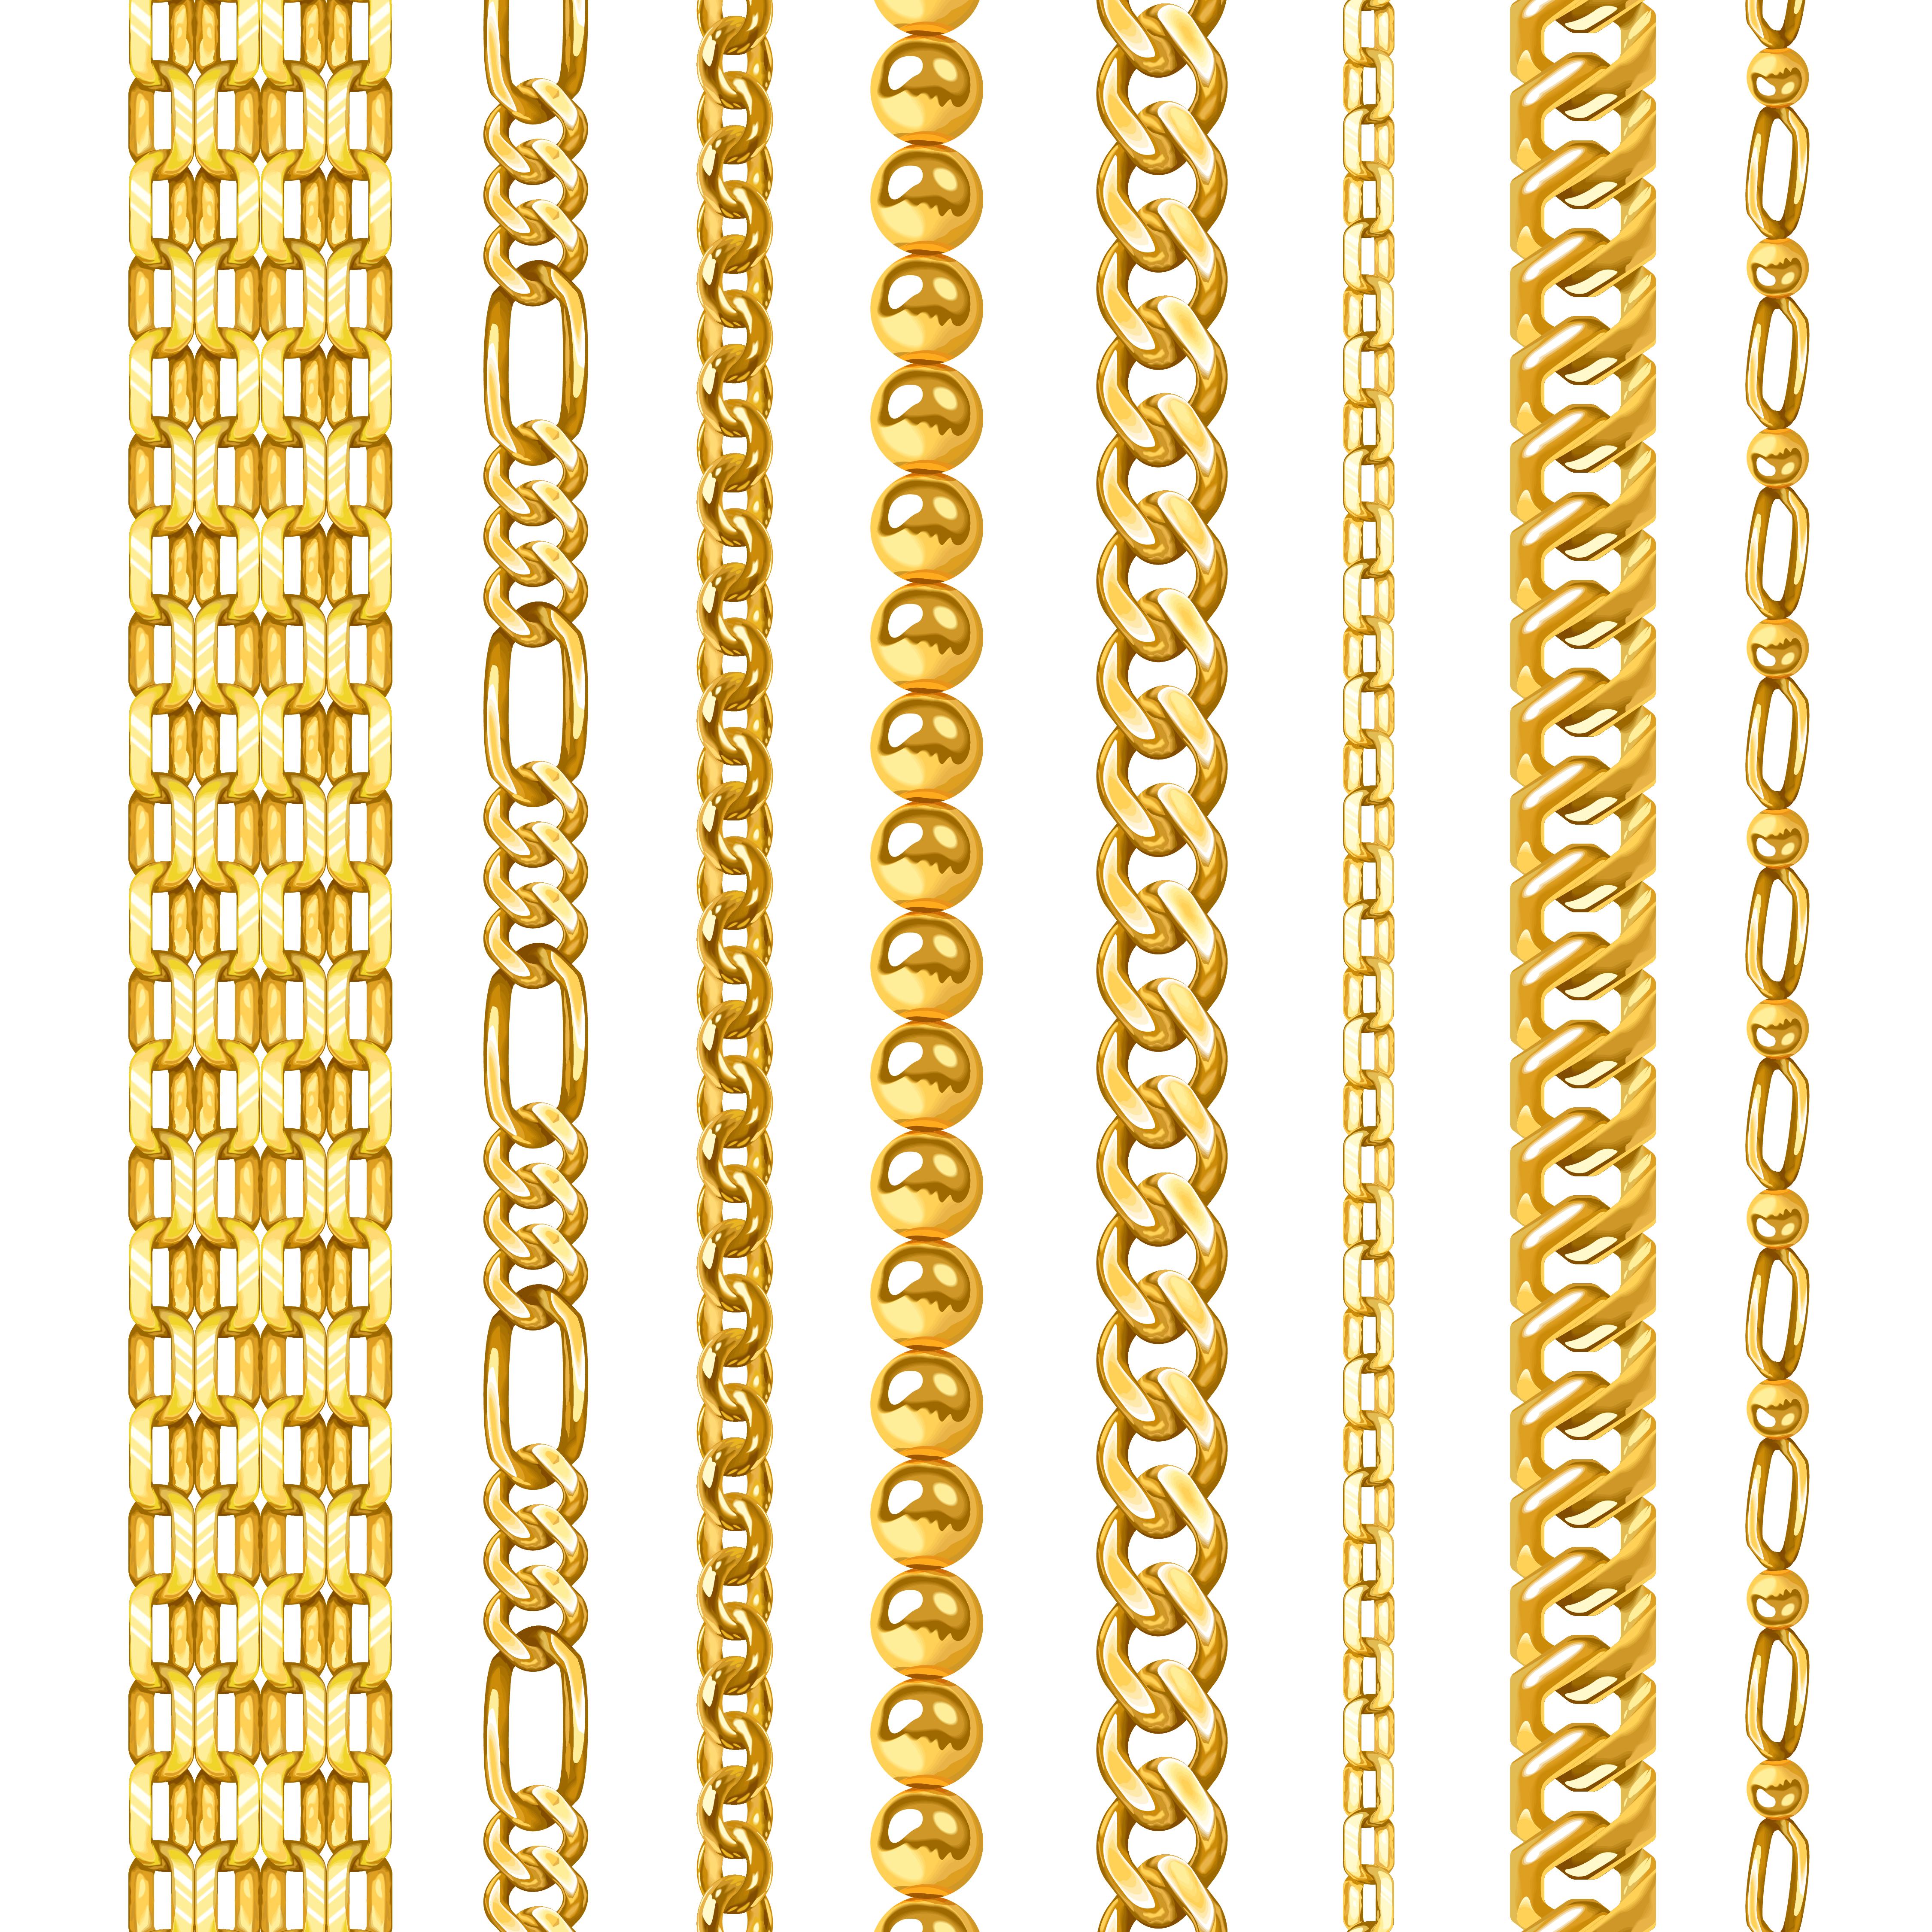 Golden Chains Set 472842 - Download Free Vectors, Clipart ...  Chain Vector